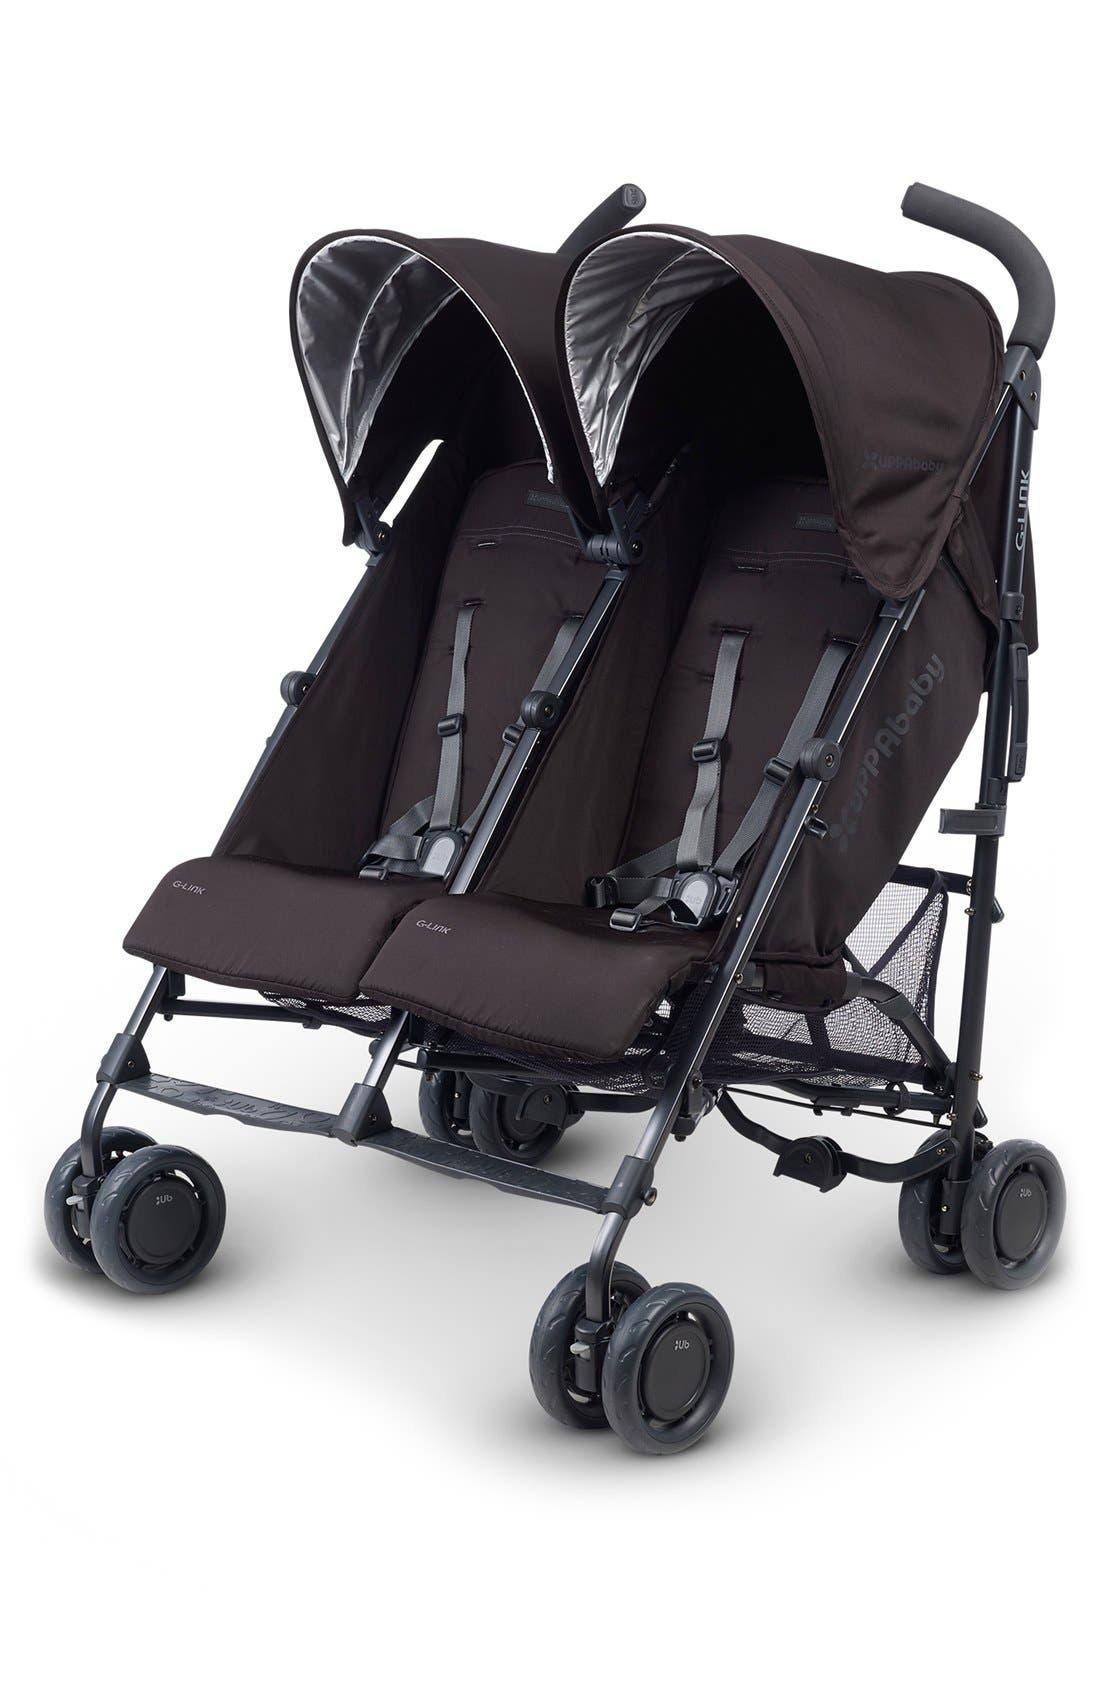 UPPAbaby G-LINK Jake Aluminum Frame Reclining Side by Side Umbrella Stroller  sc 1 st  Nordstrom & Baby Strollers: Jogging Reclining \u0026 Frames | Nordstrom islam-shia.org